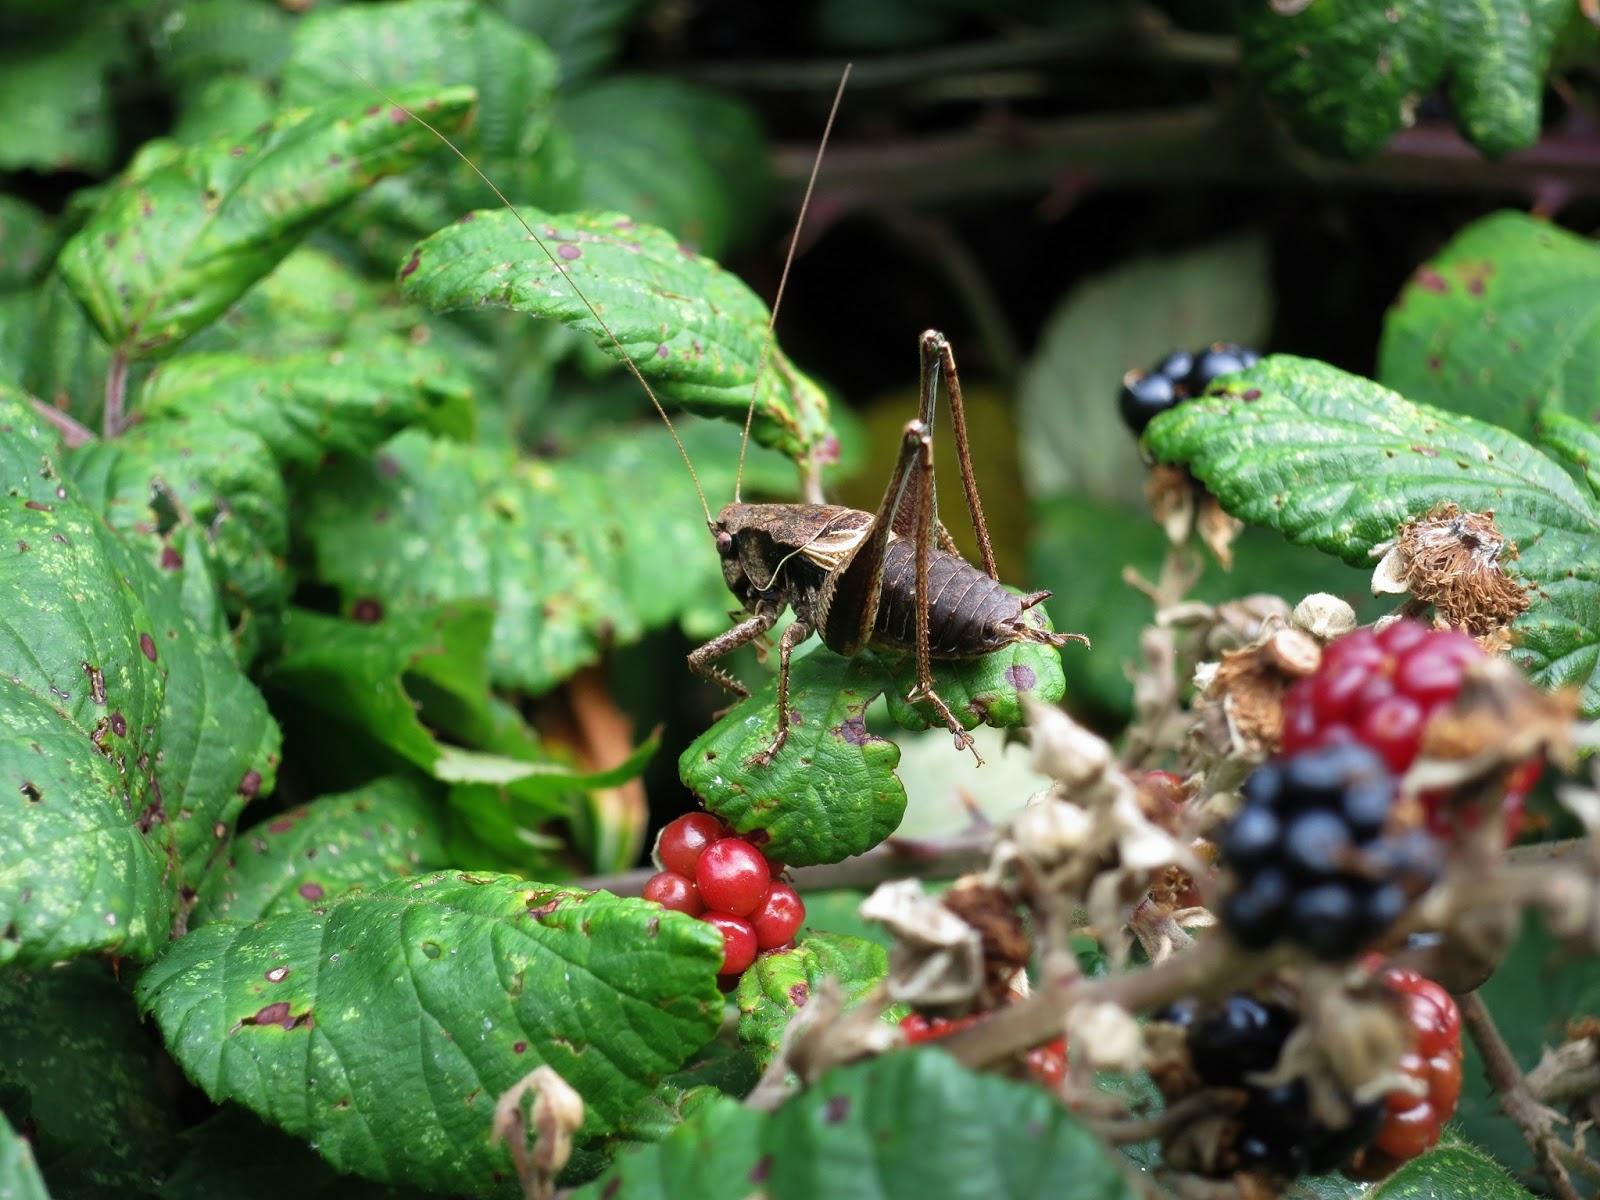 Dark Bush Cricket sitting on a bramble